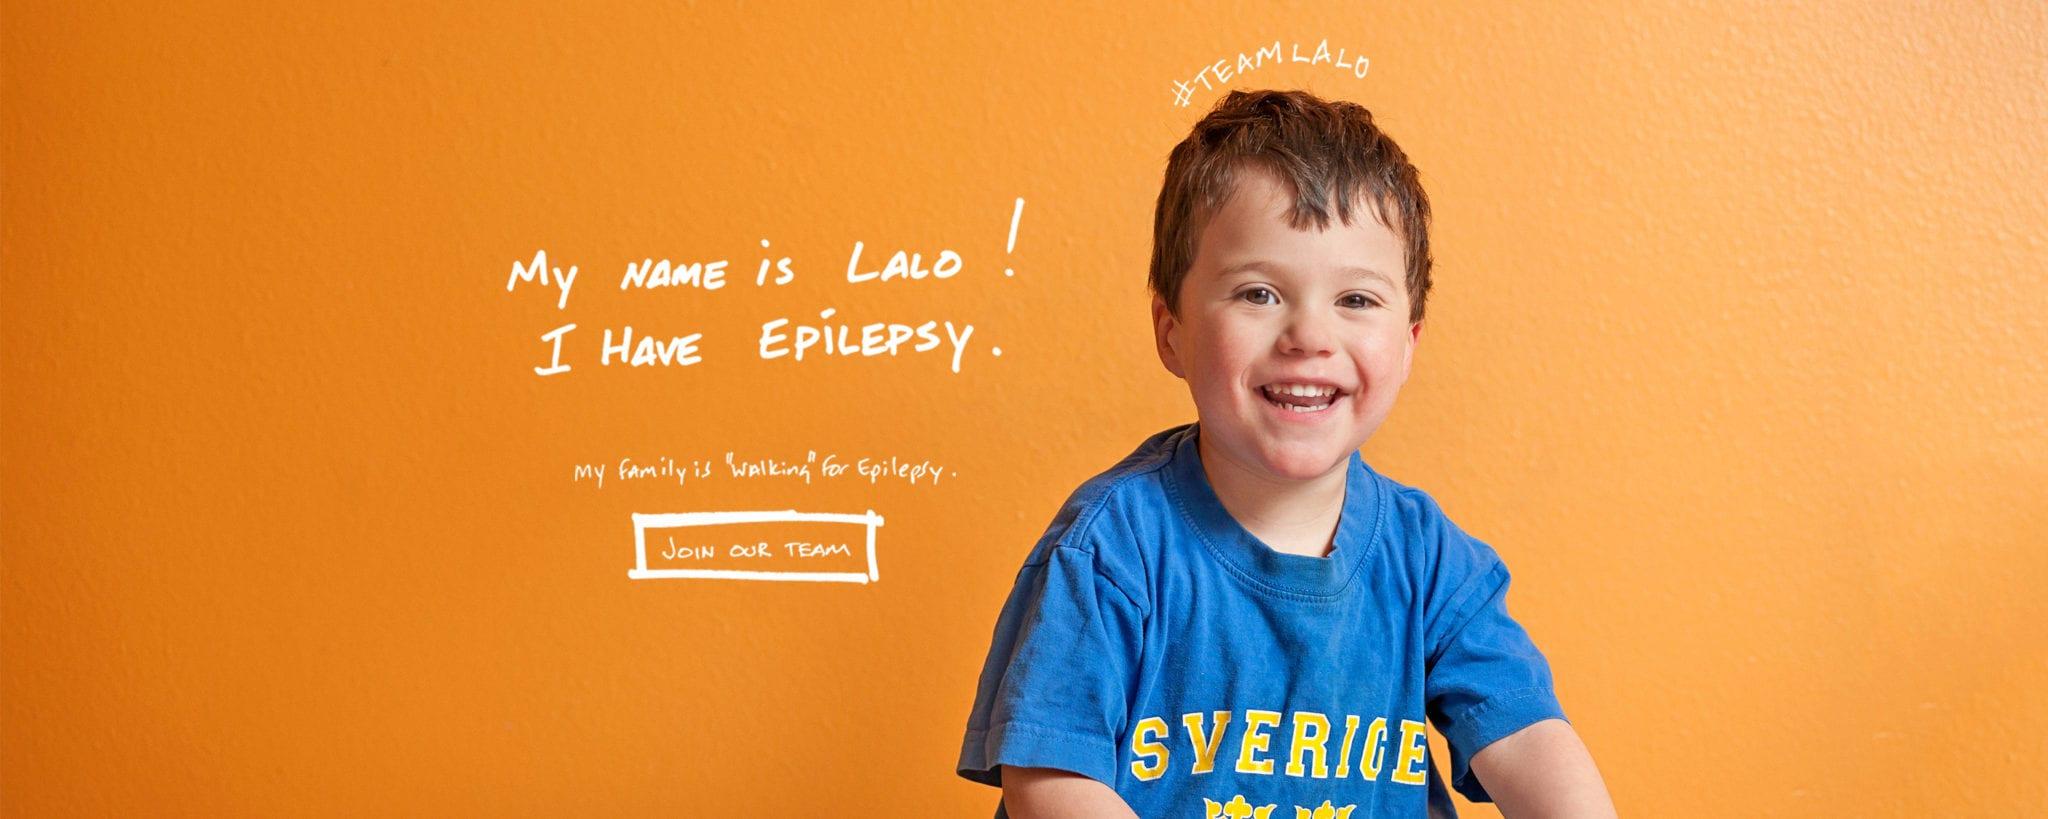 LaloEpilepsy2016-homepage-1875x985pxB